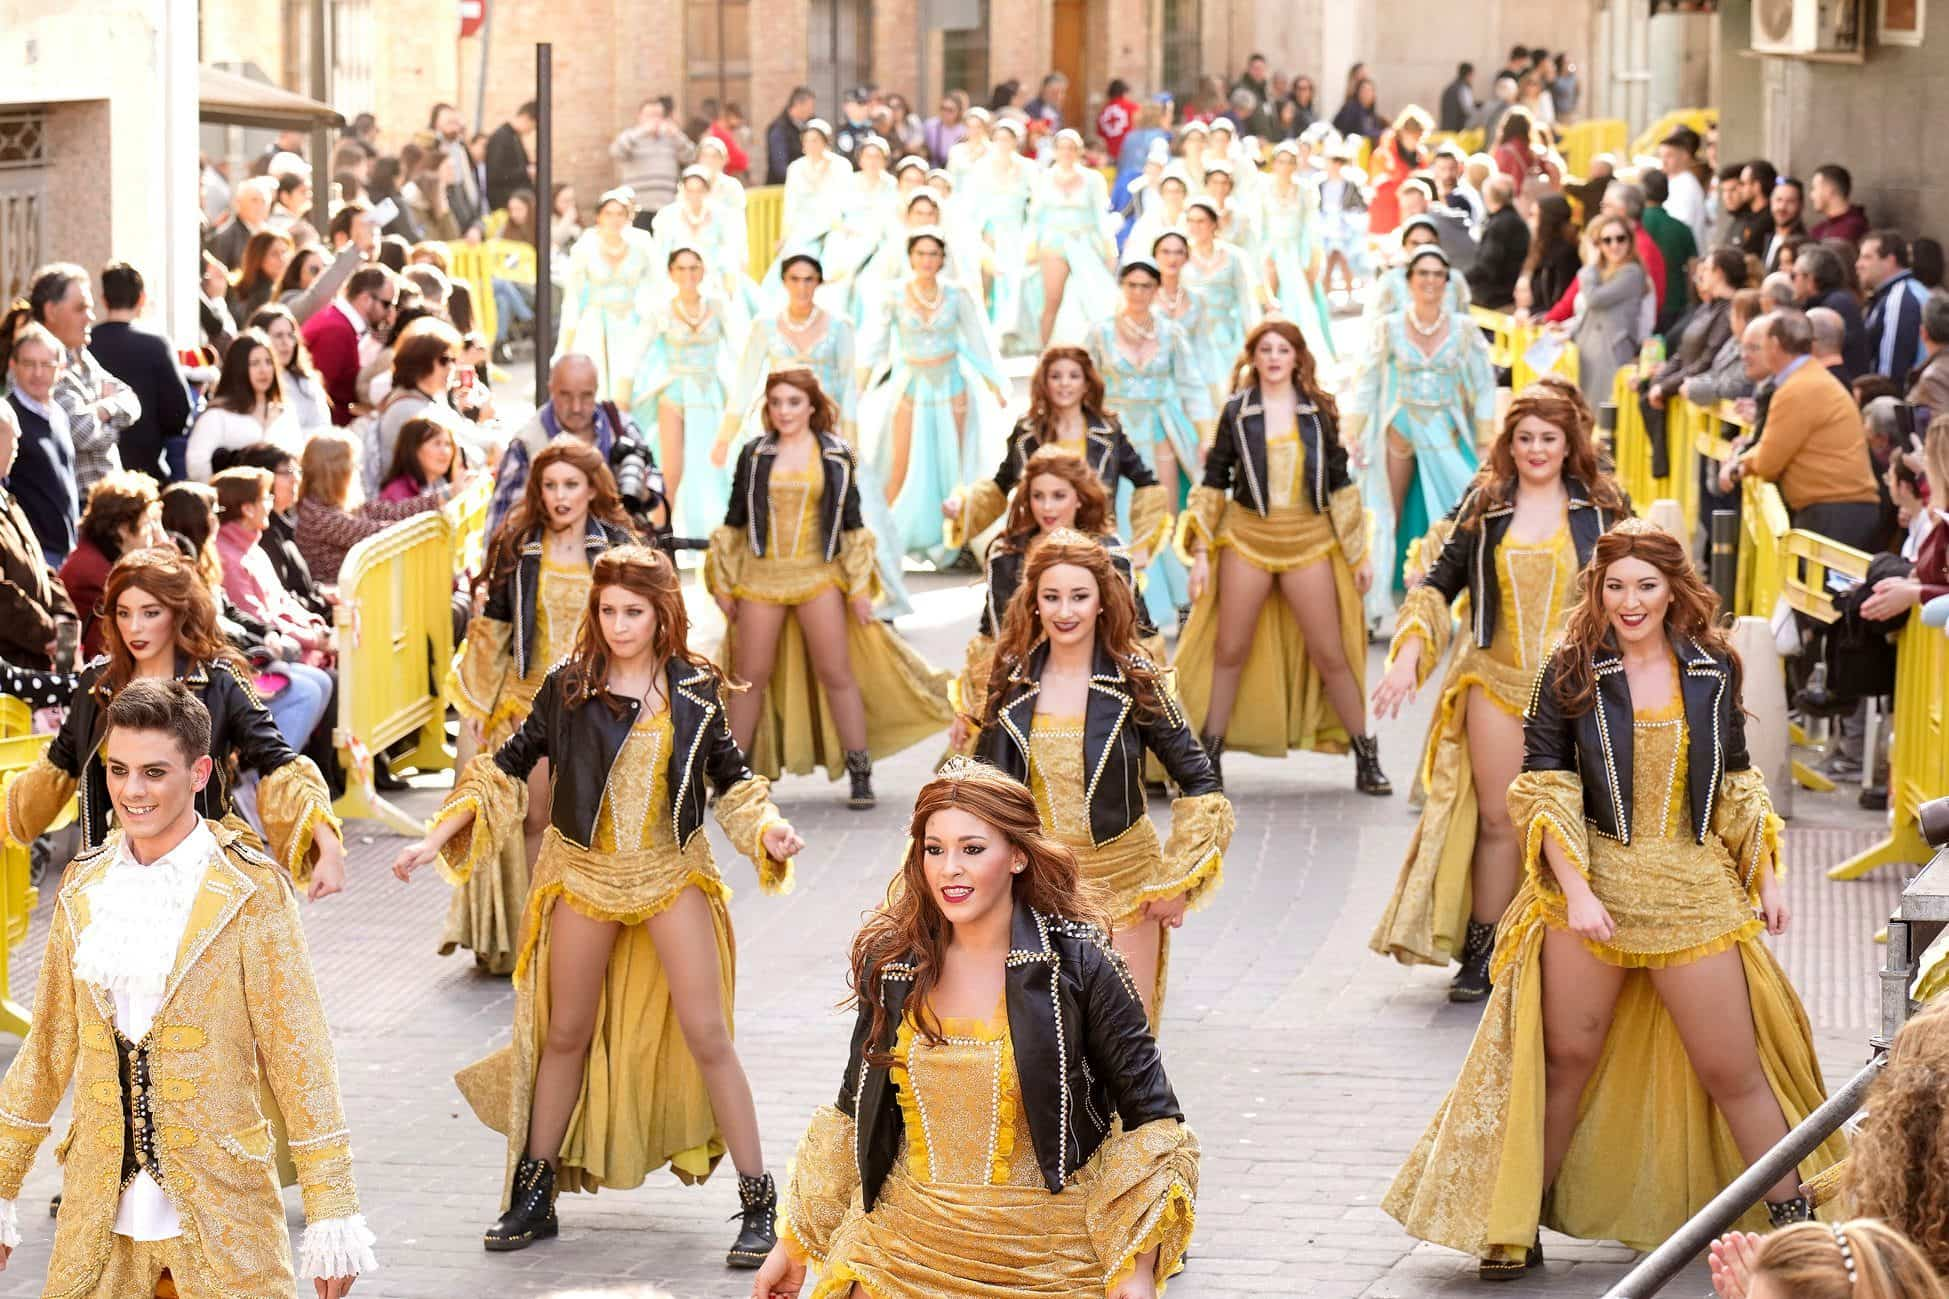 Carnaval de herencia 2020 ofertorio 95 - Selección de fotografías del Ofertorio del Carnaval de Herencia